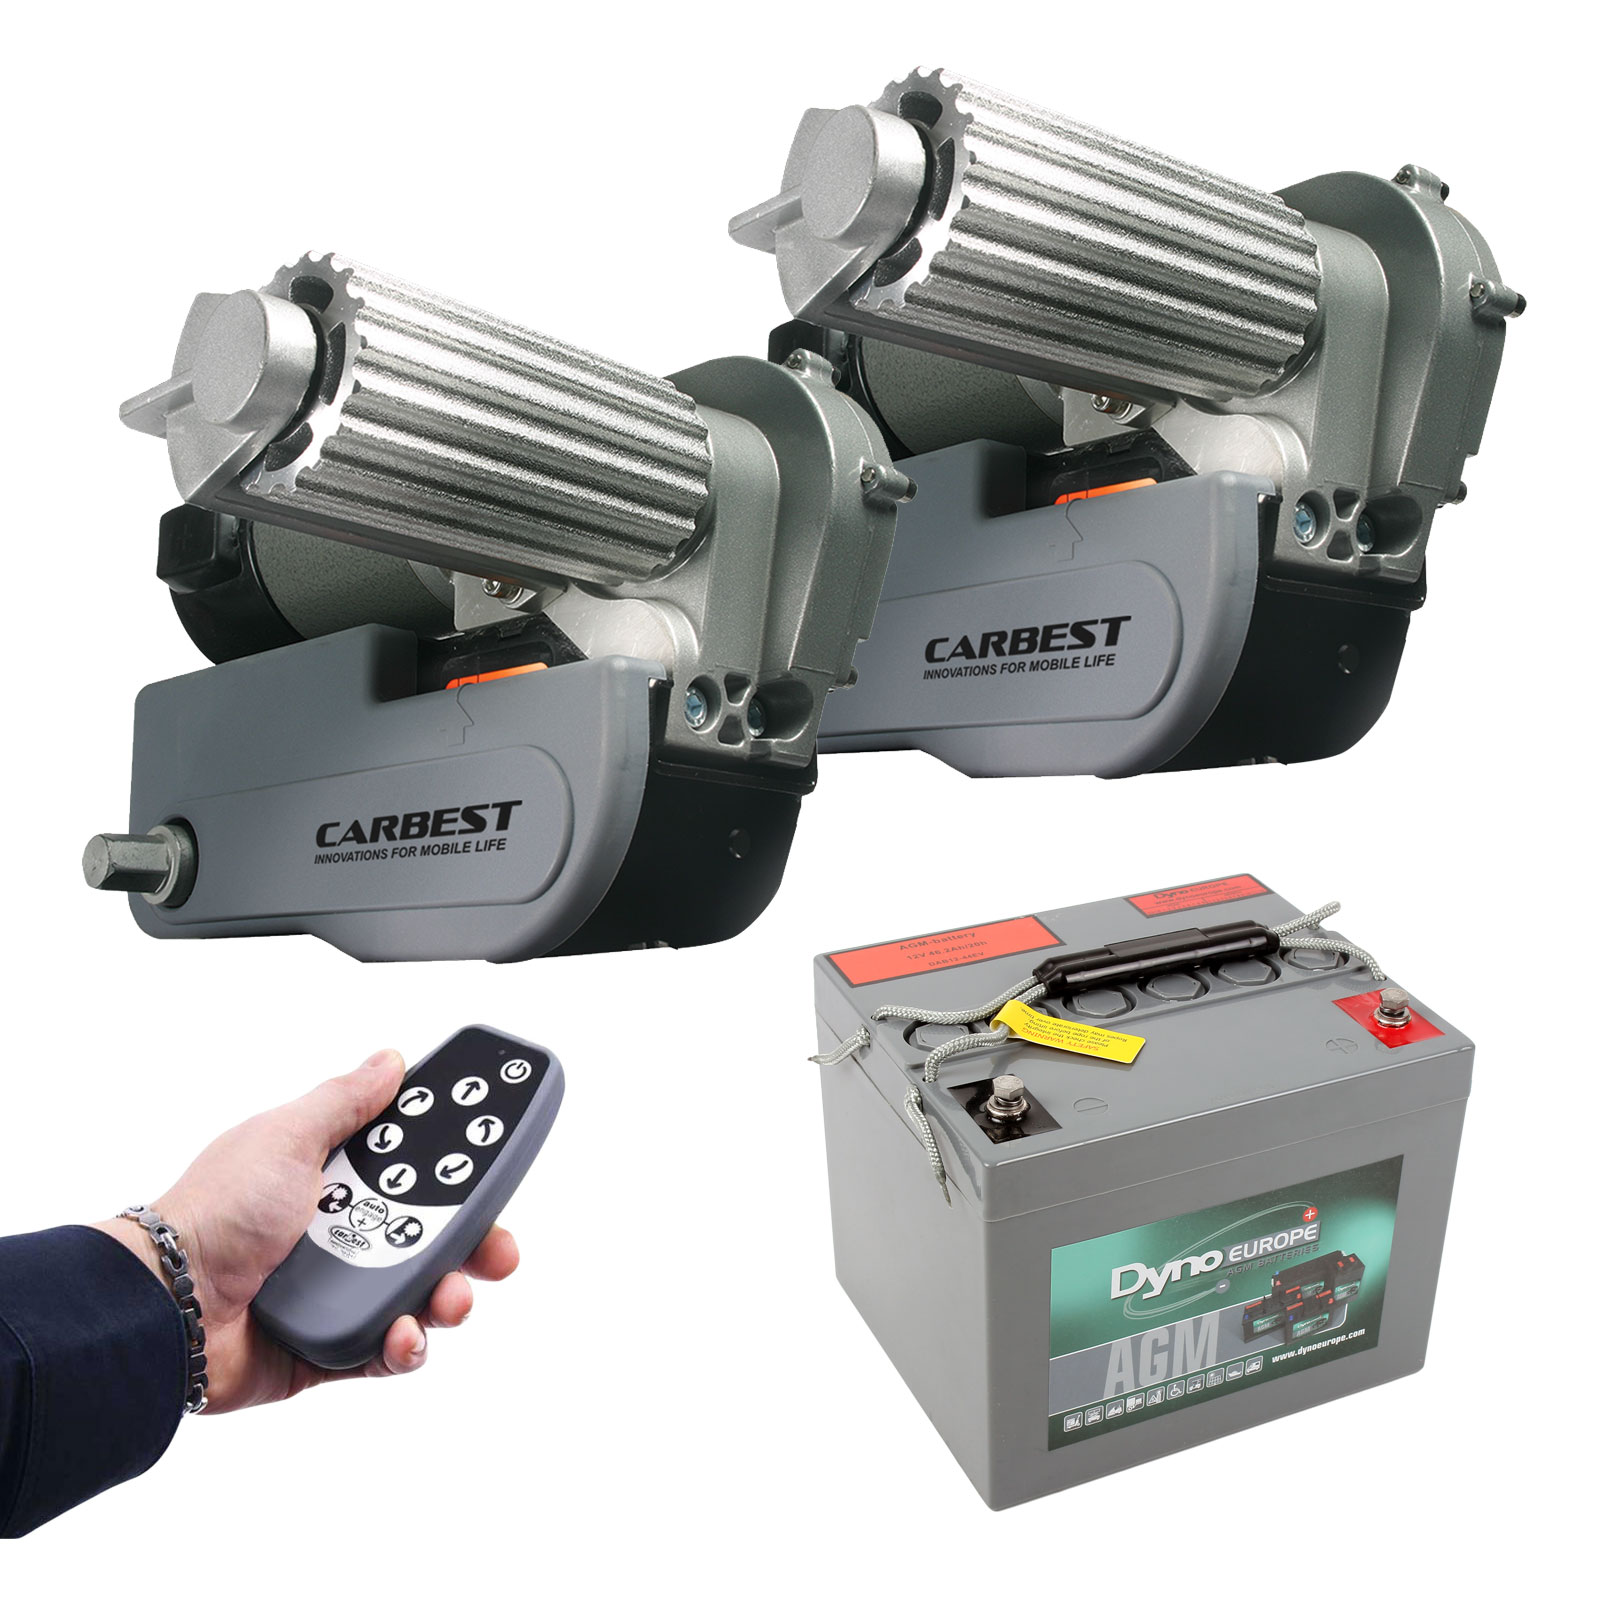 Cara-Move automatische Rangierhilfe, Batterie, Ladegerät 2250Kg